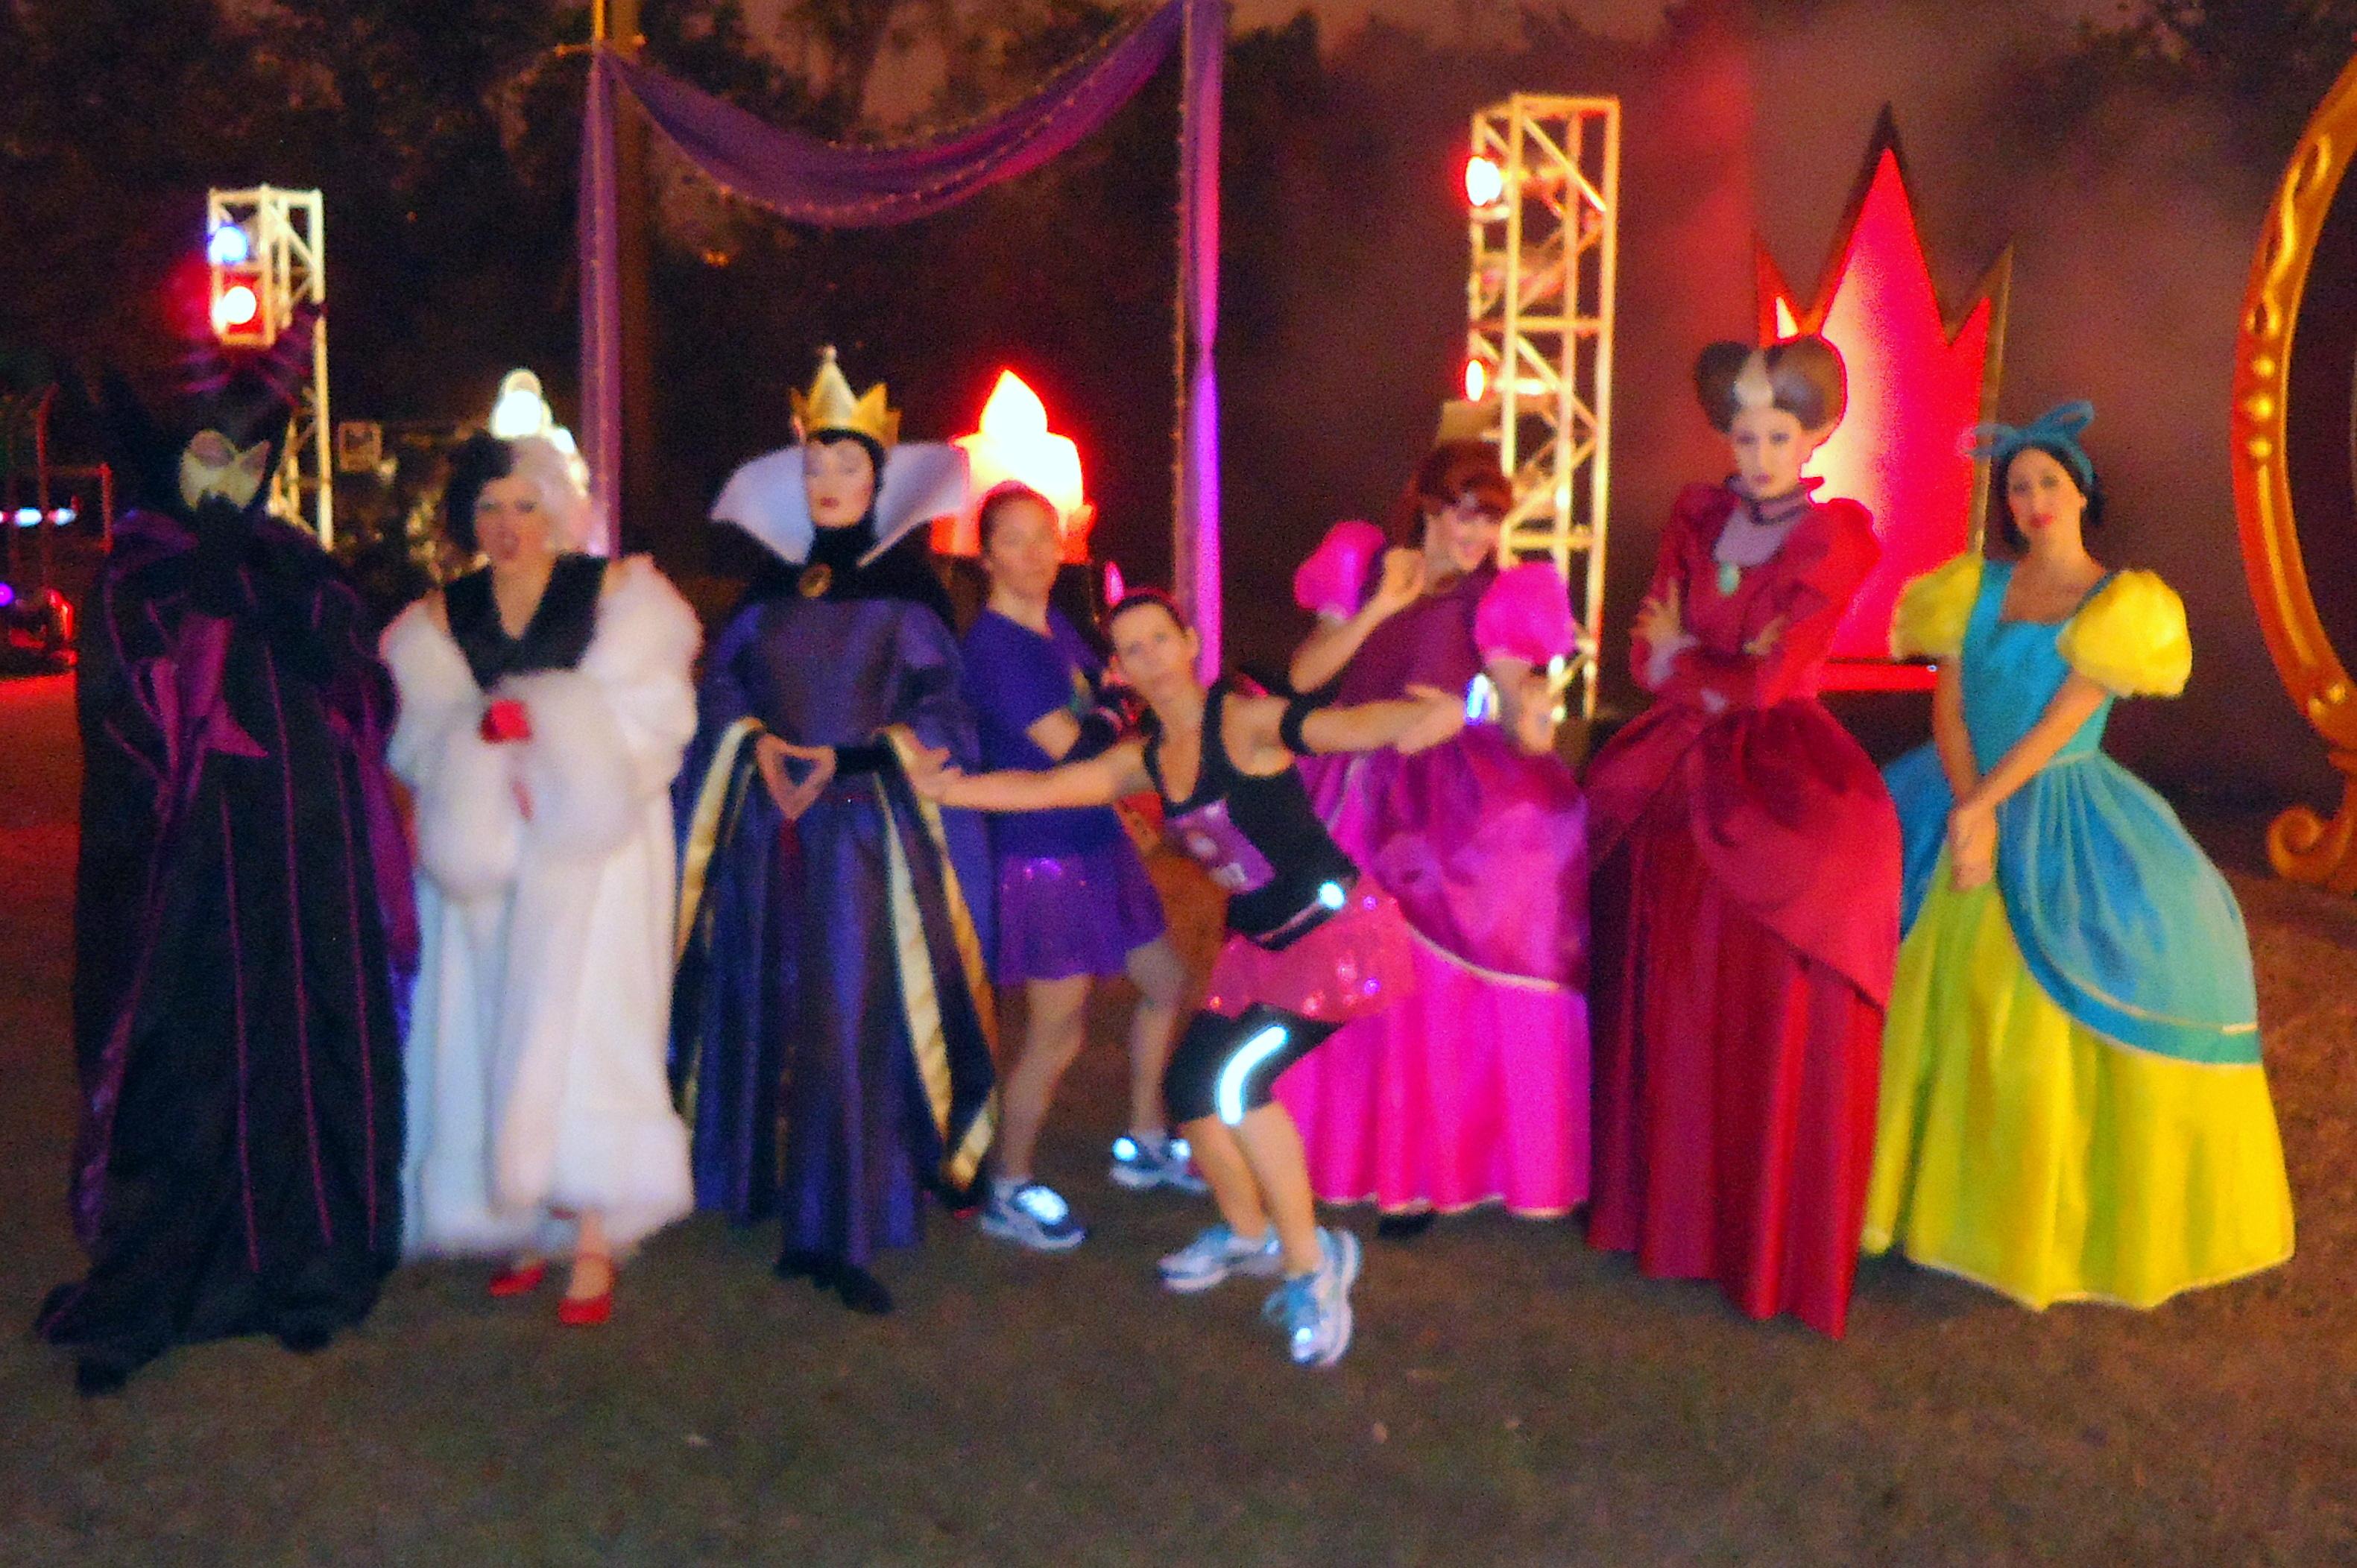 Assured, disney princess as villains good